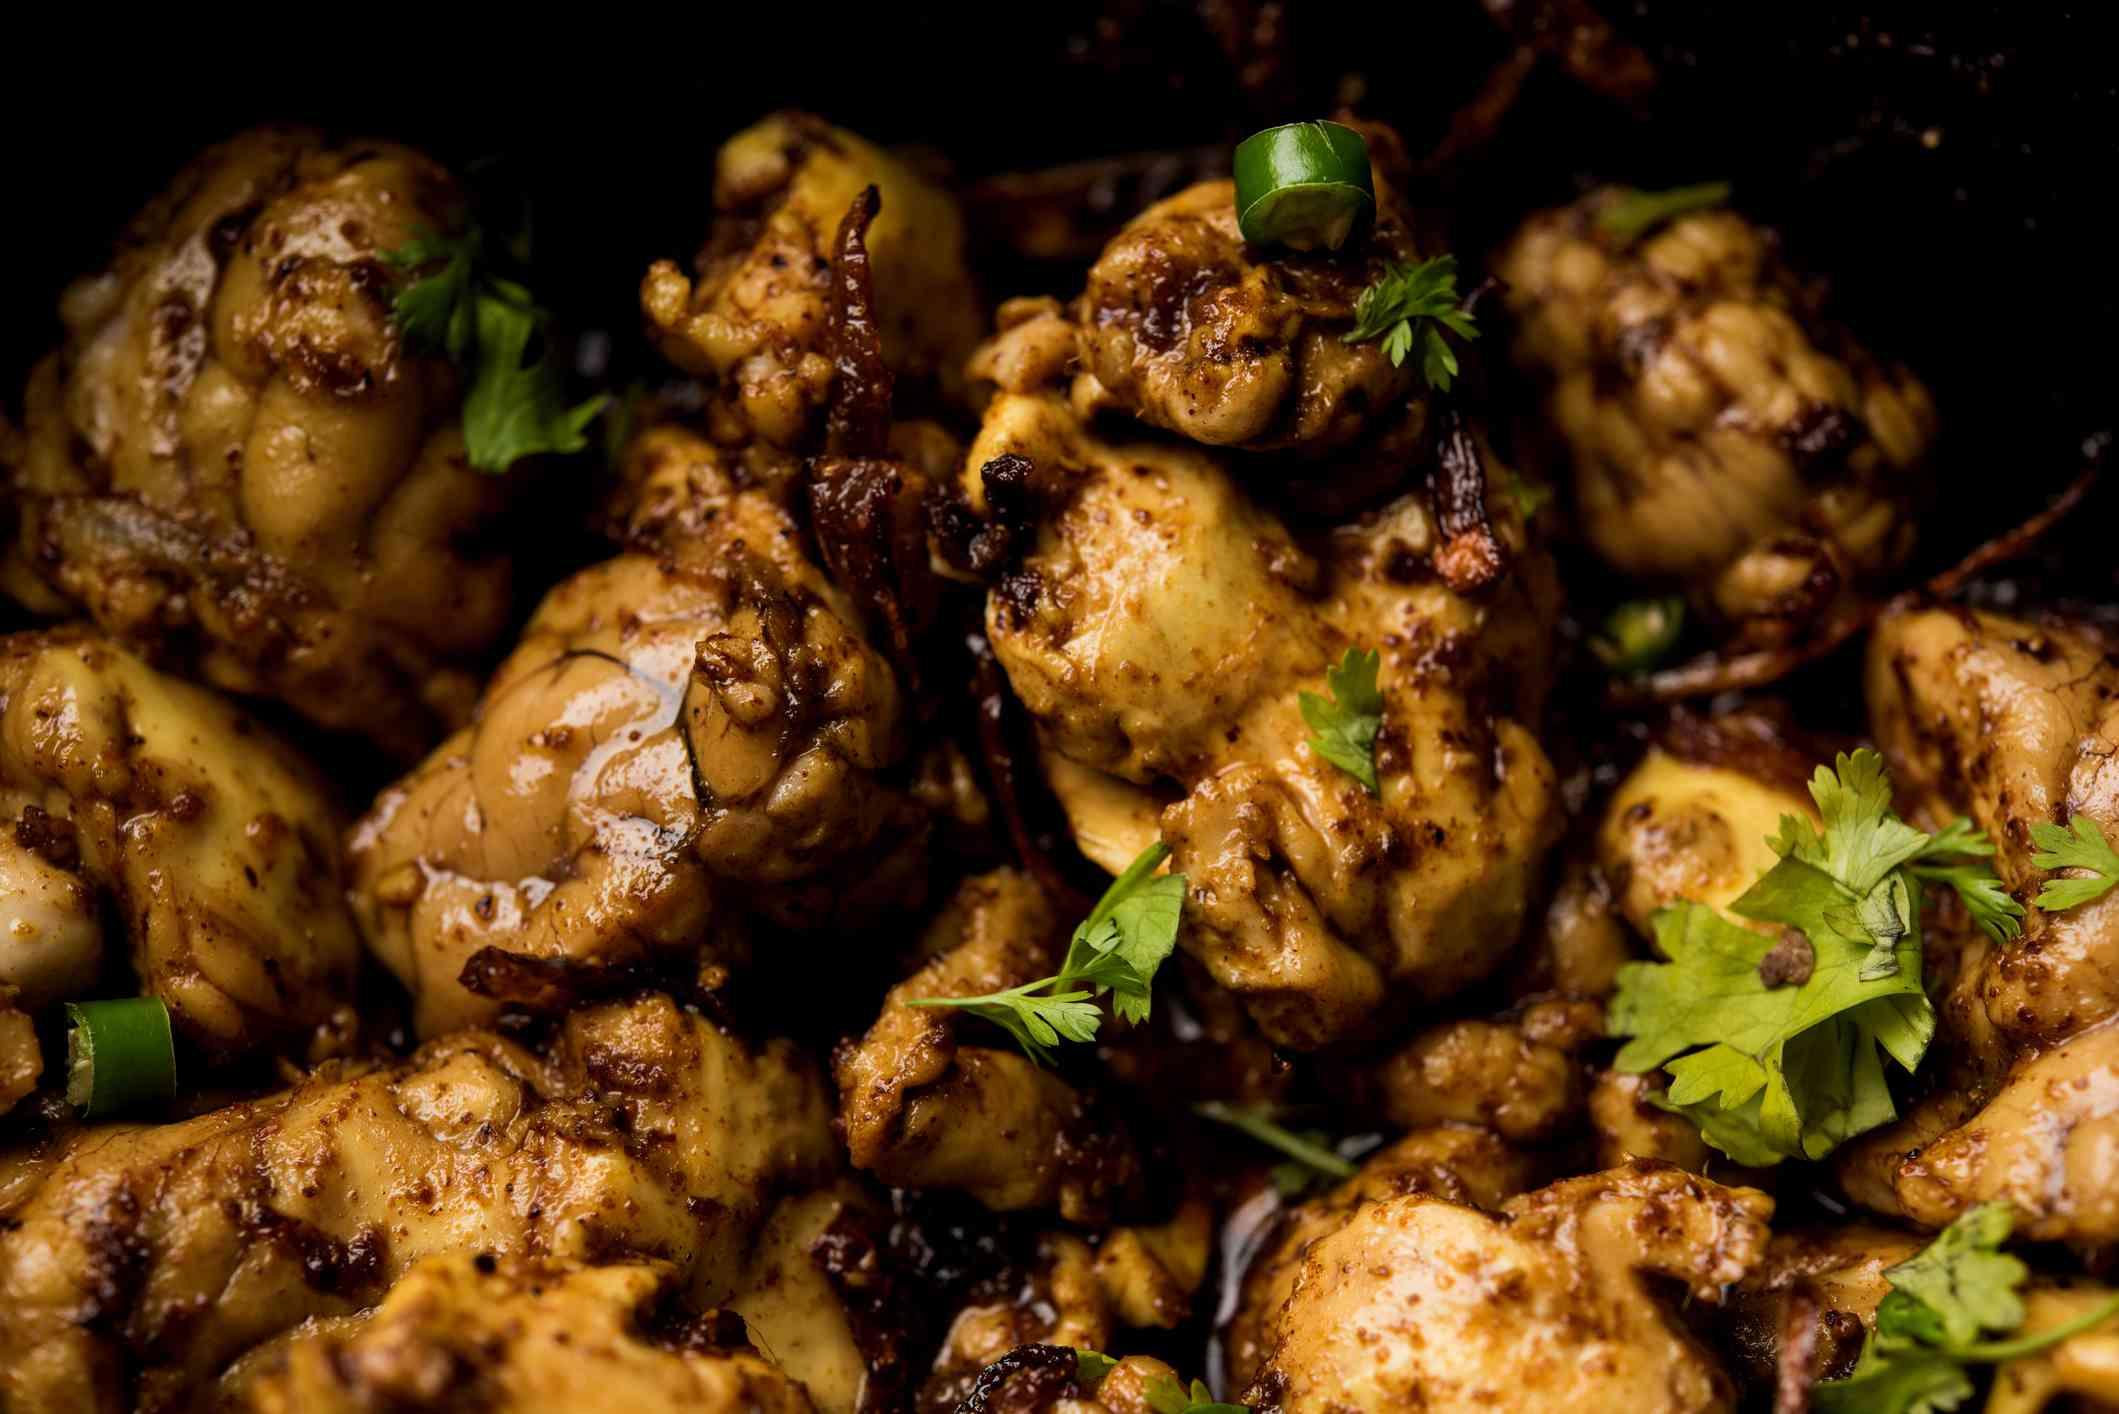 Bheja fry, fried goat brains.